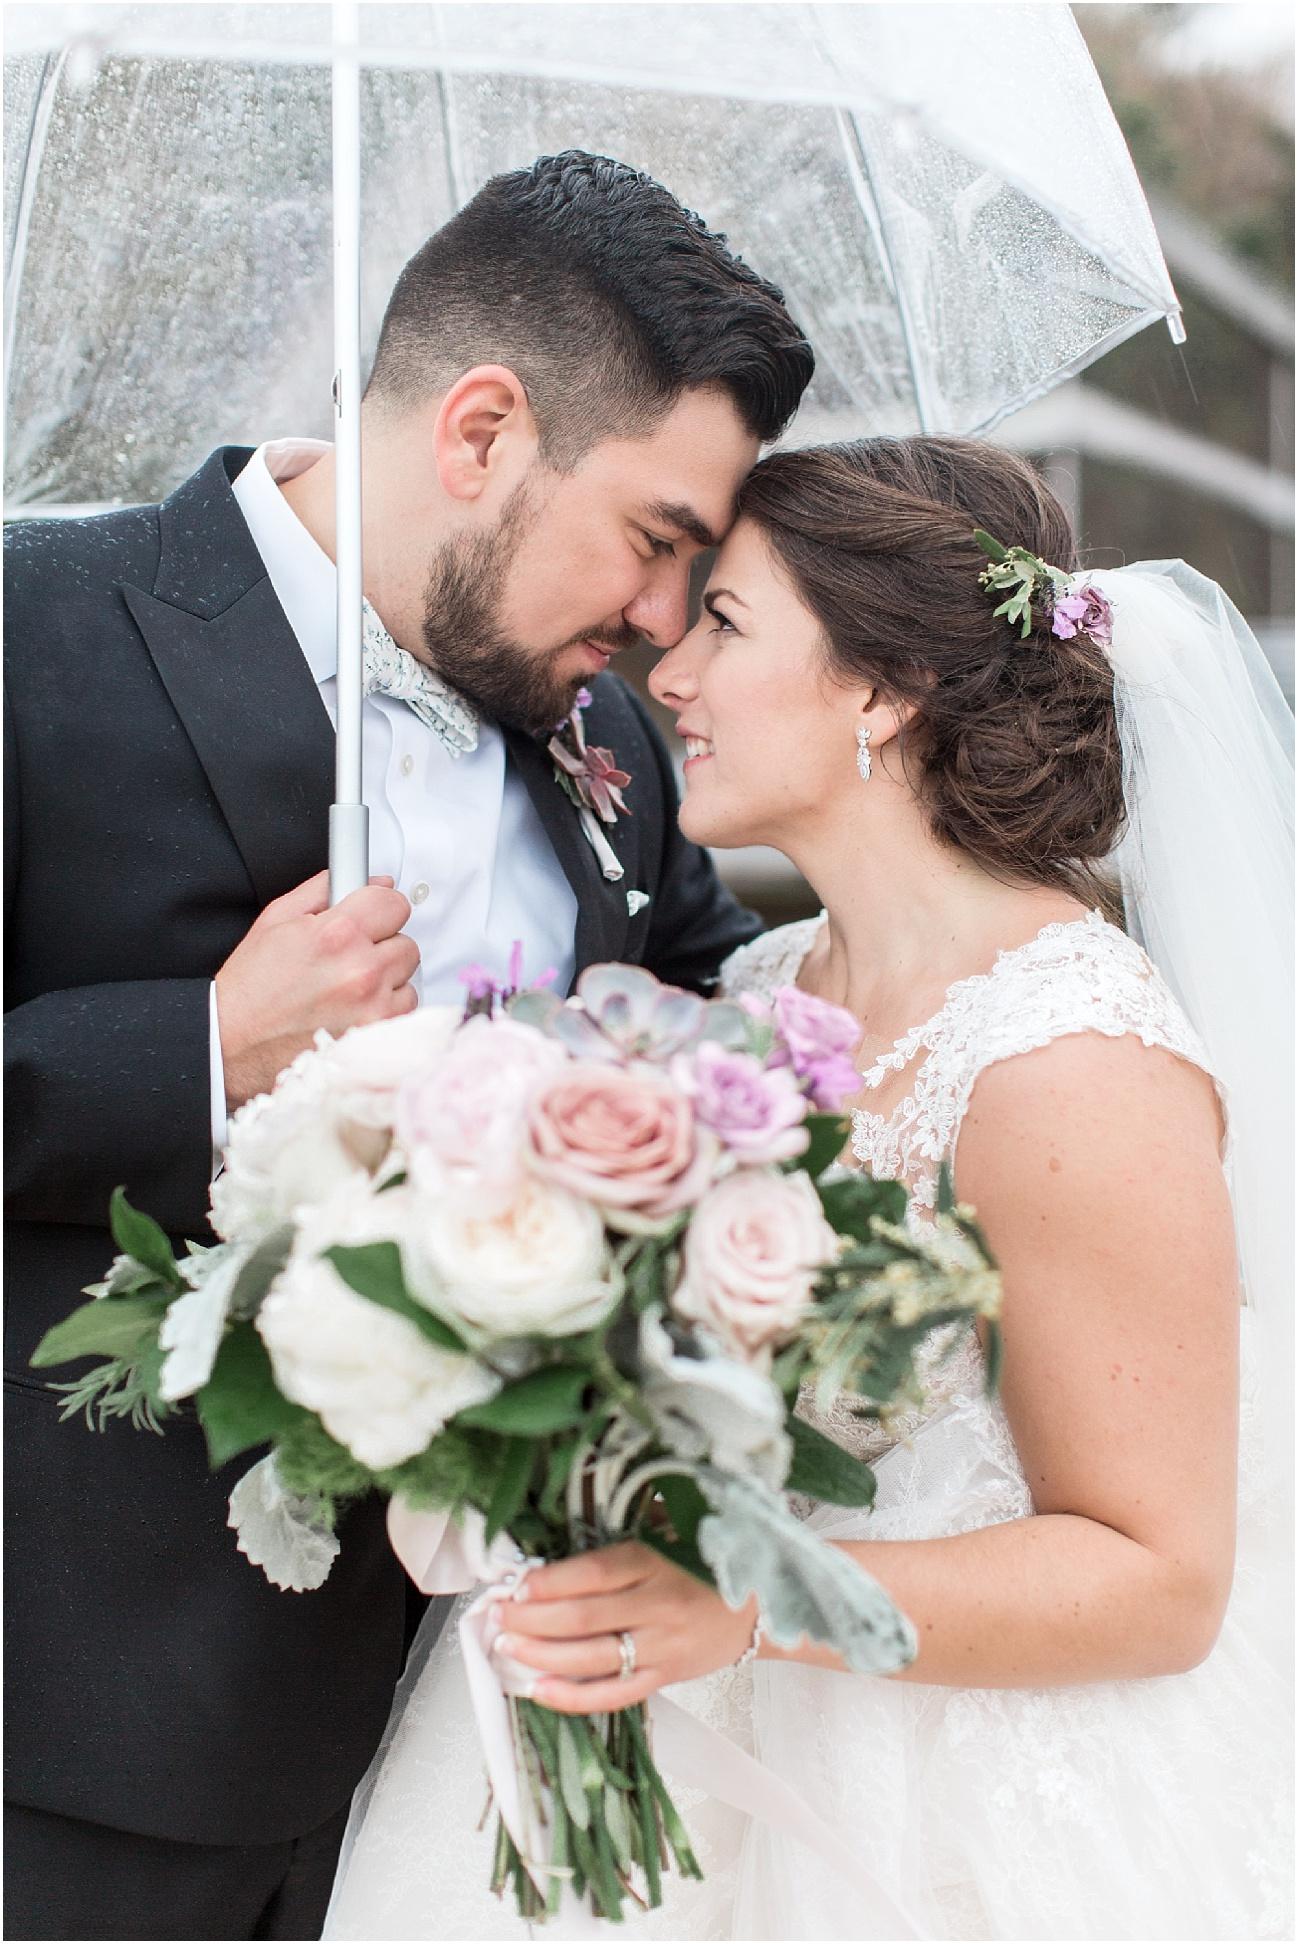 courtney_kurt_cape_cod_popponessett_inn_dowses_beach_boston_wedding_meredith_jane_photography_photo_0064.jpg